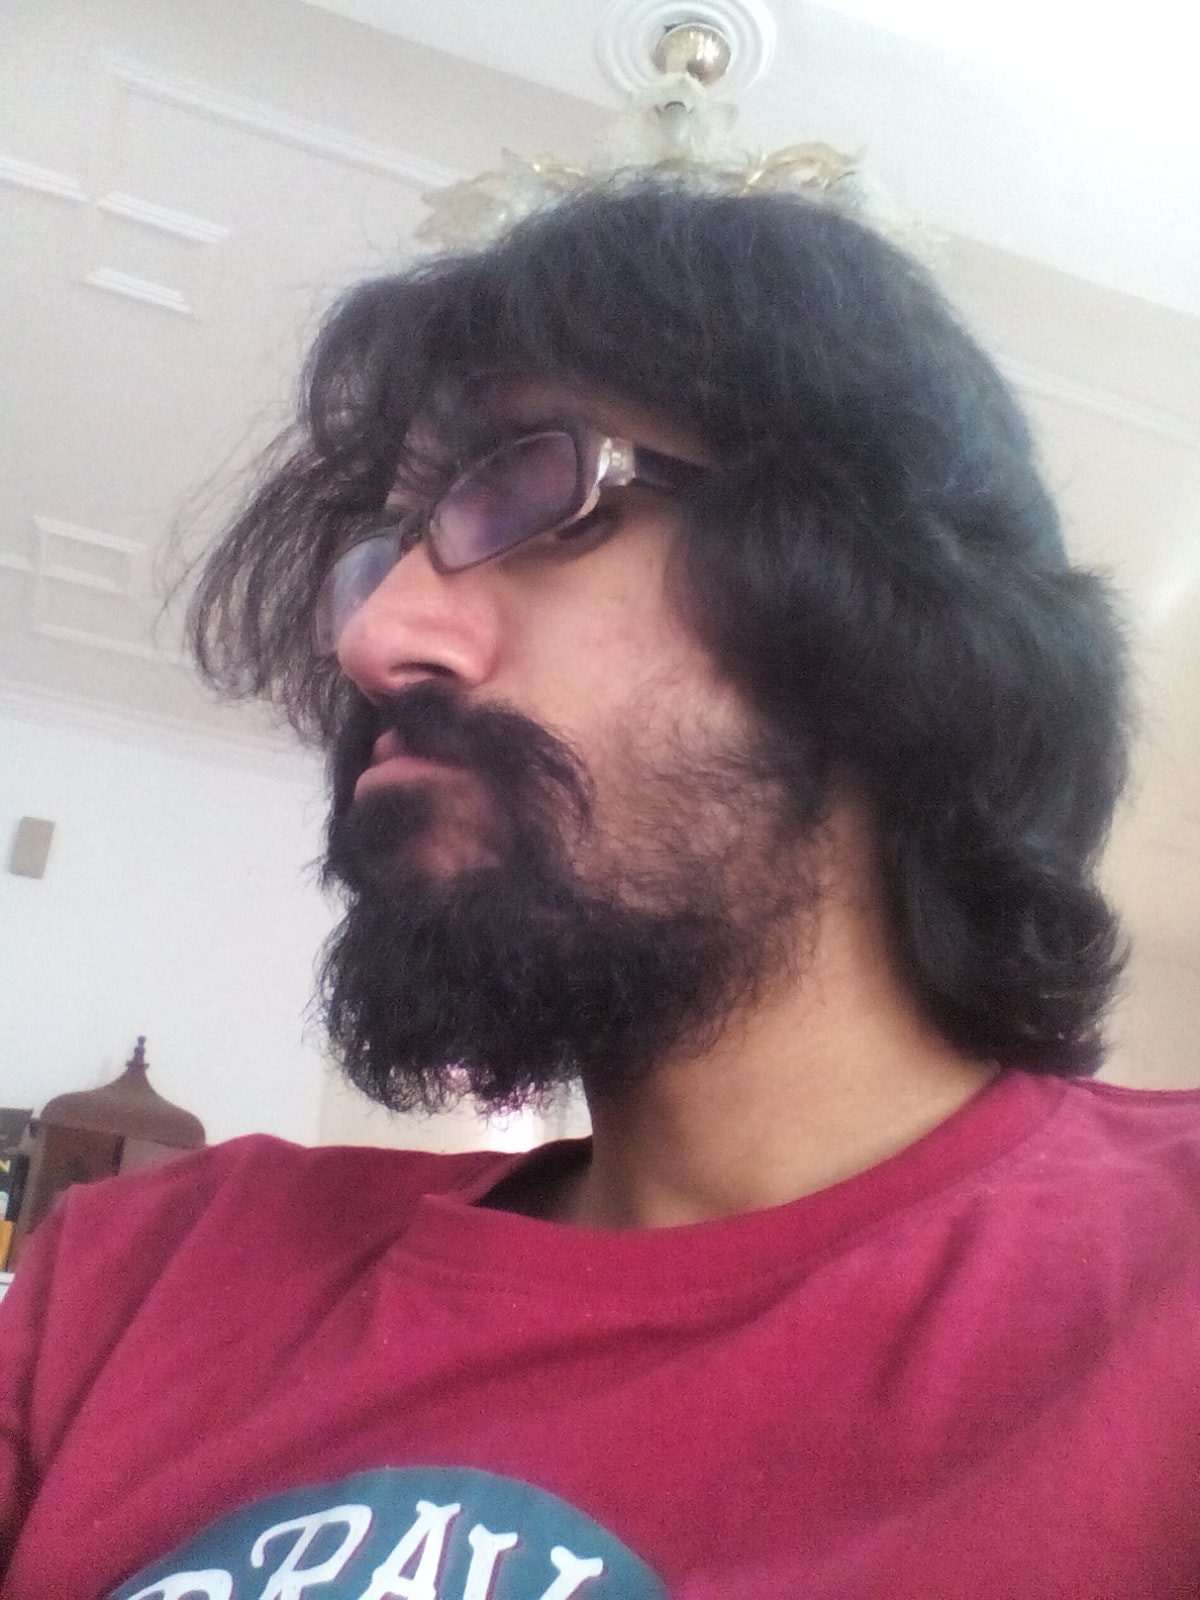 Go to faris fawaaz's profile